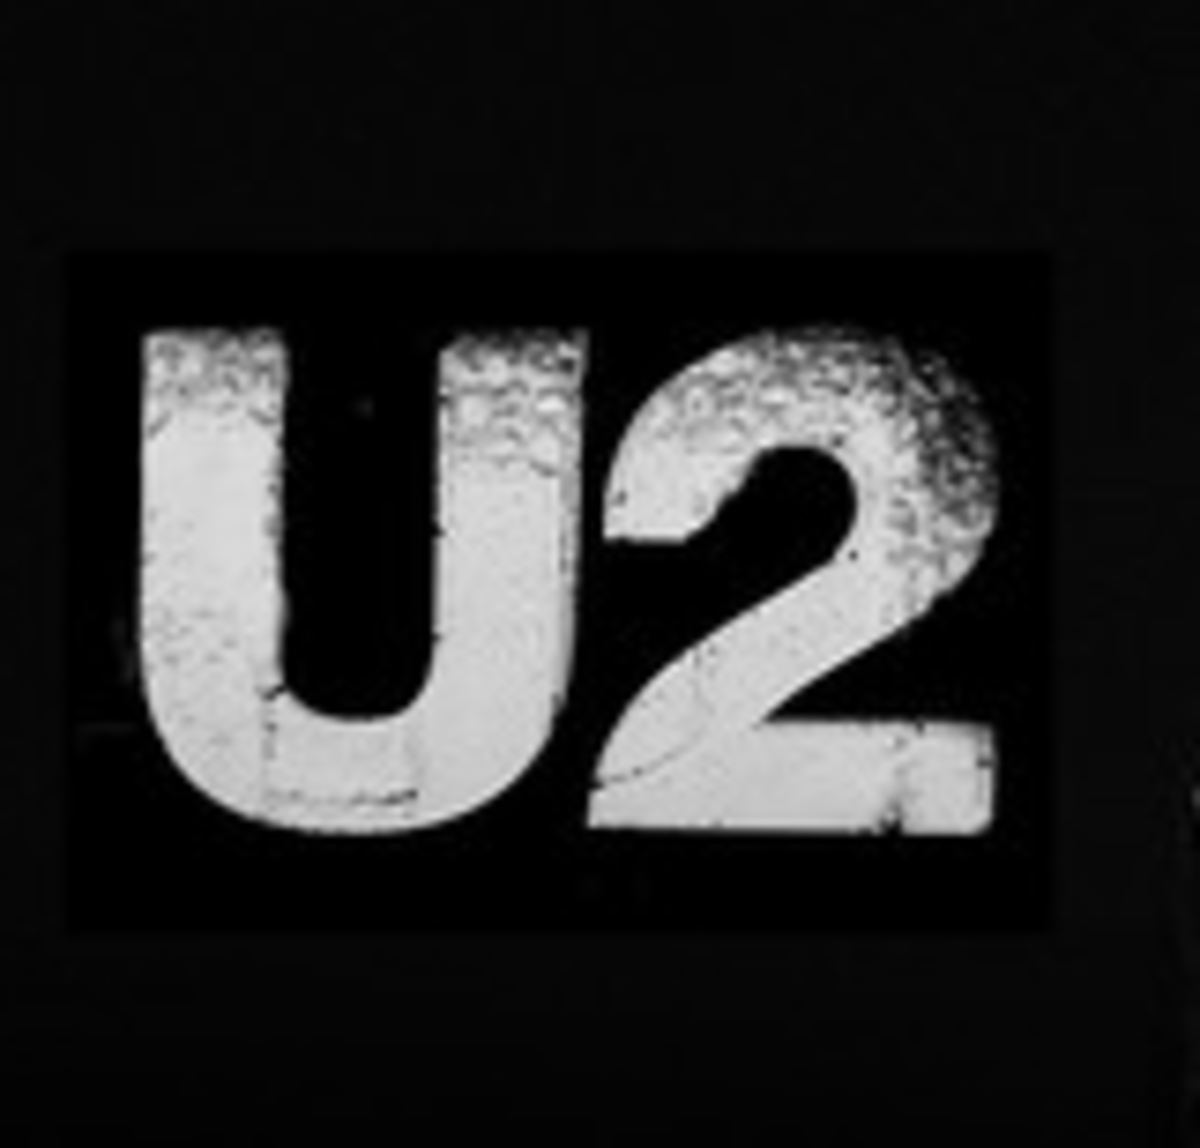 Download U2's new album for FREE!